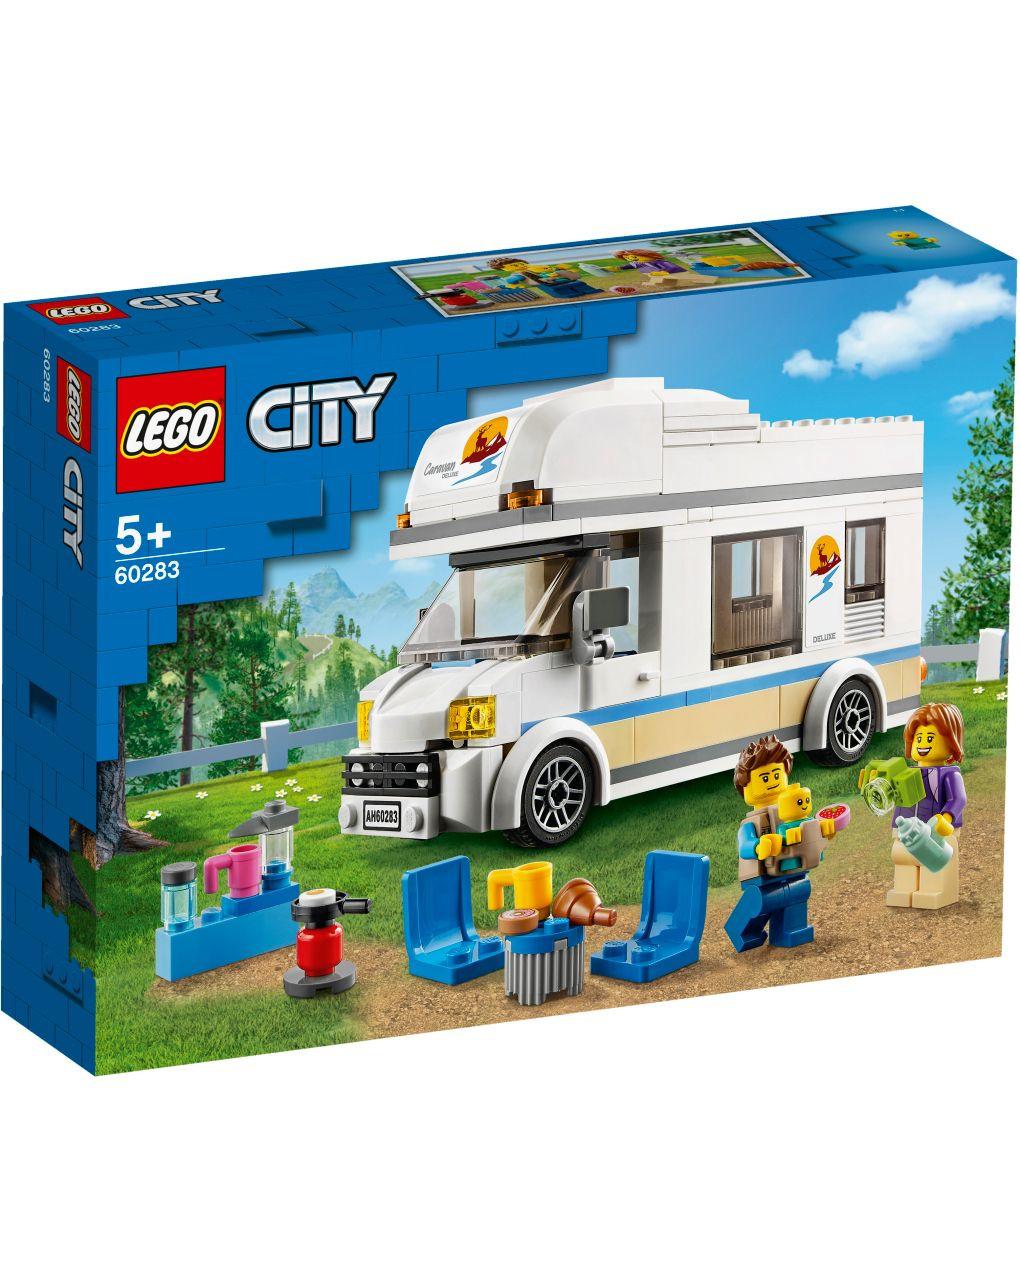 Lego city great vehicles - camper delle vacanze - 60283 - LEGO